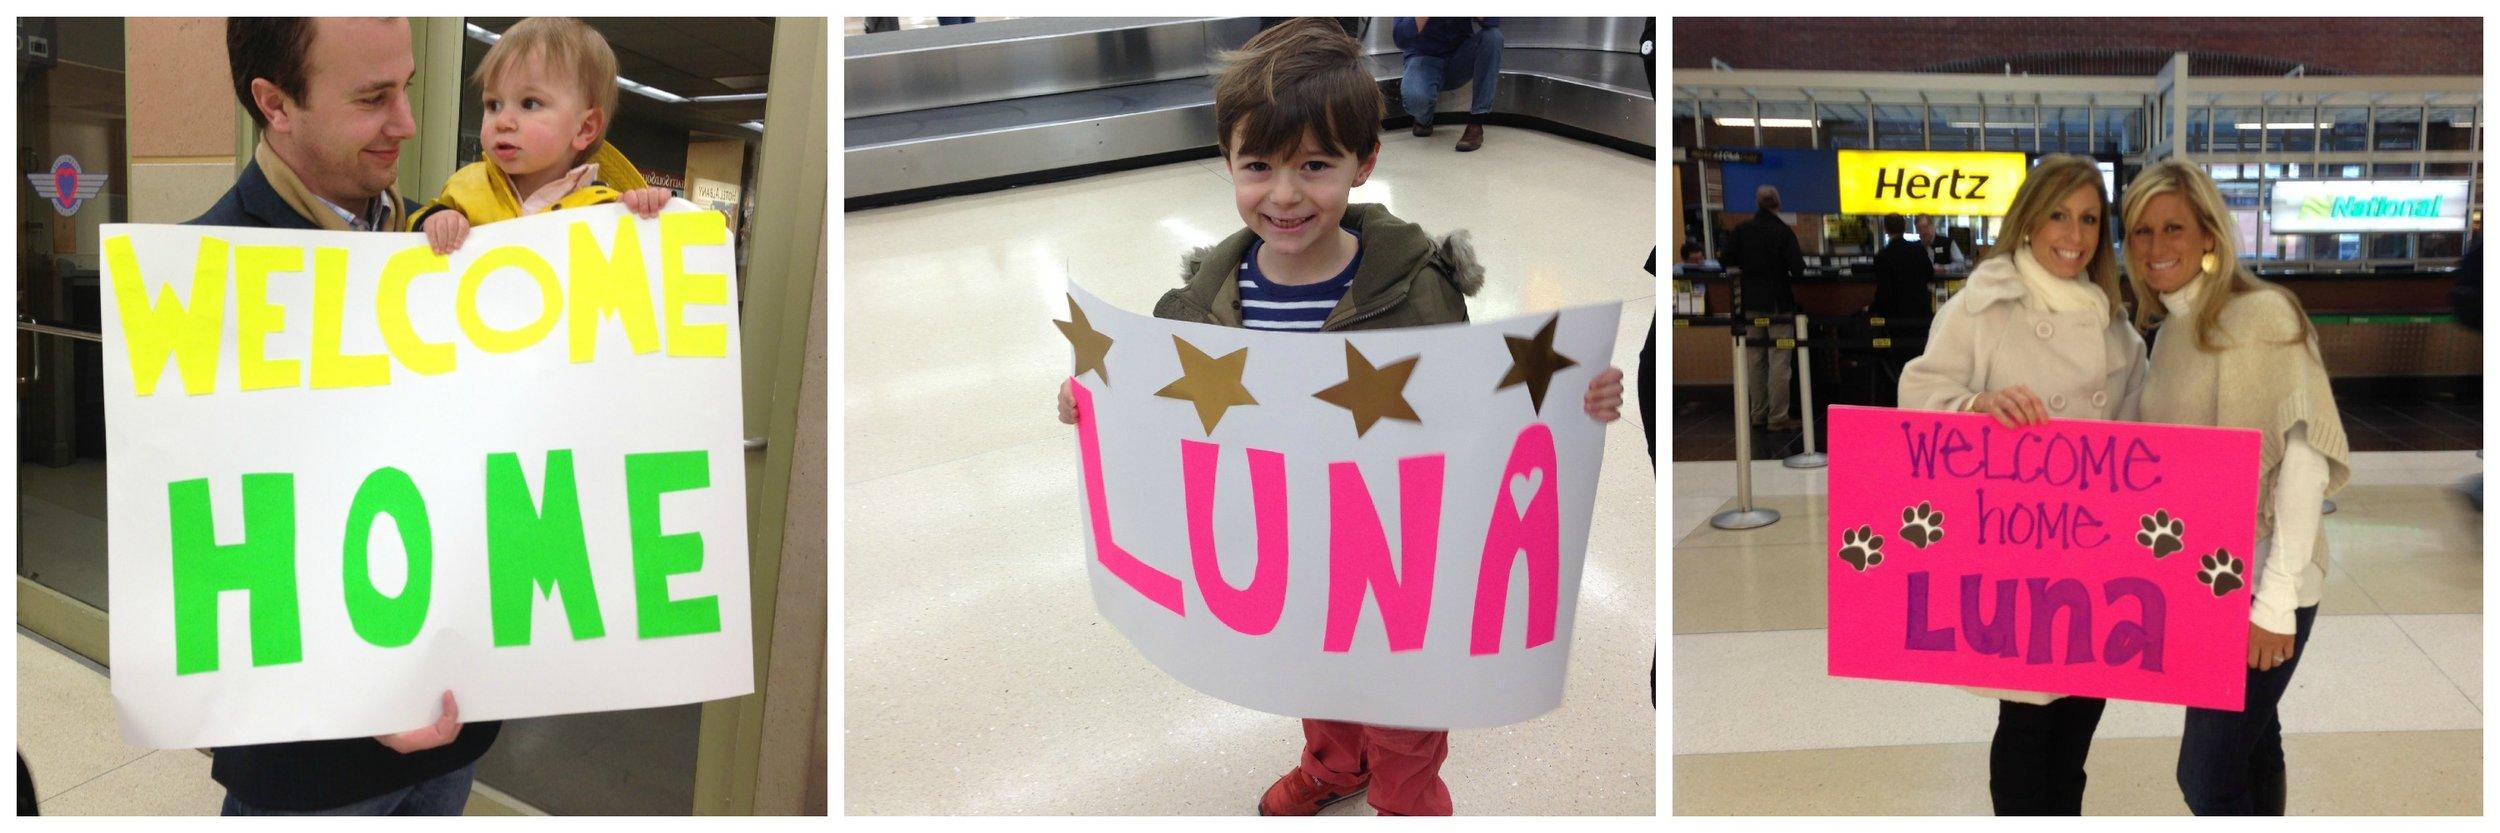 lunaswelcome